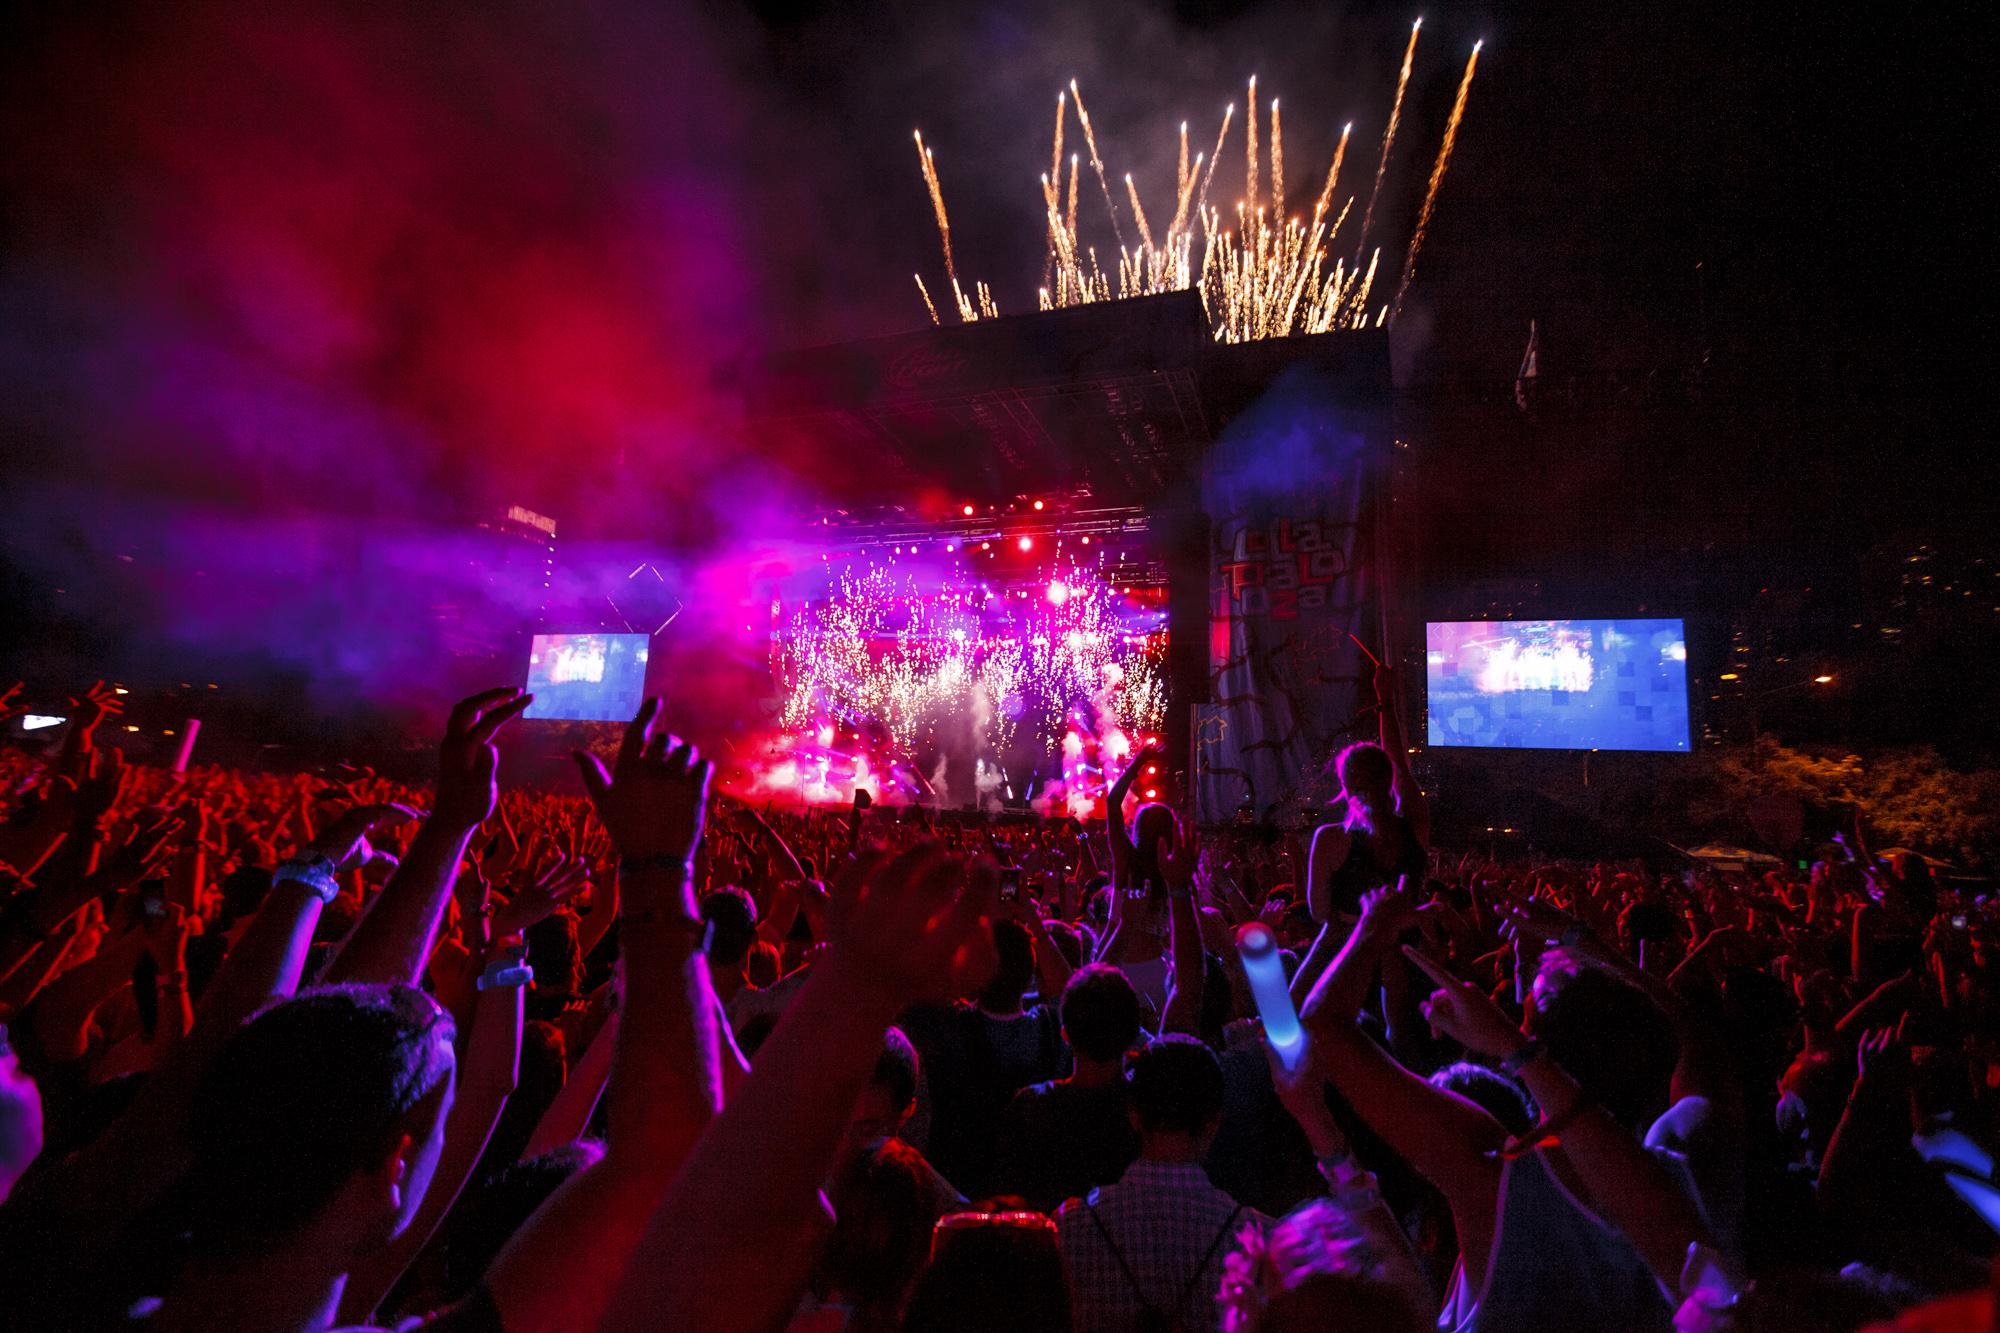 Lollapalooza Festival kommt nach Deutschland